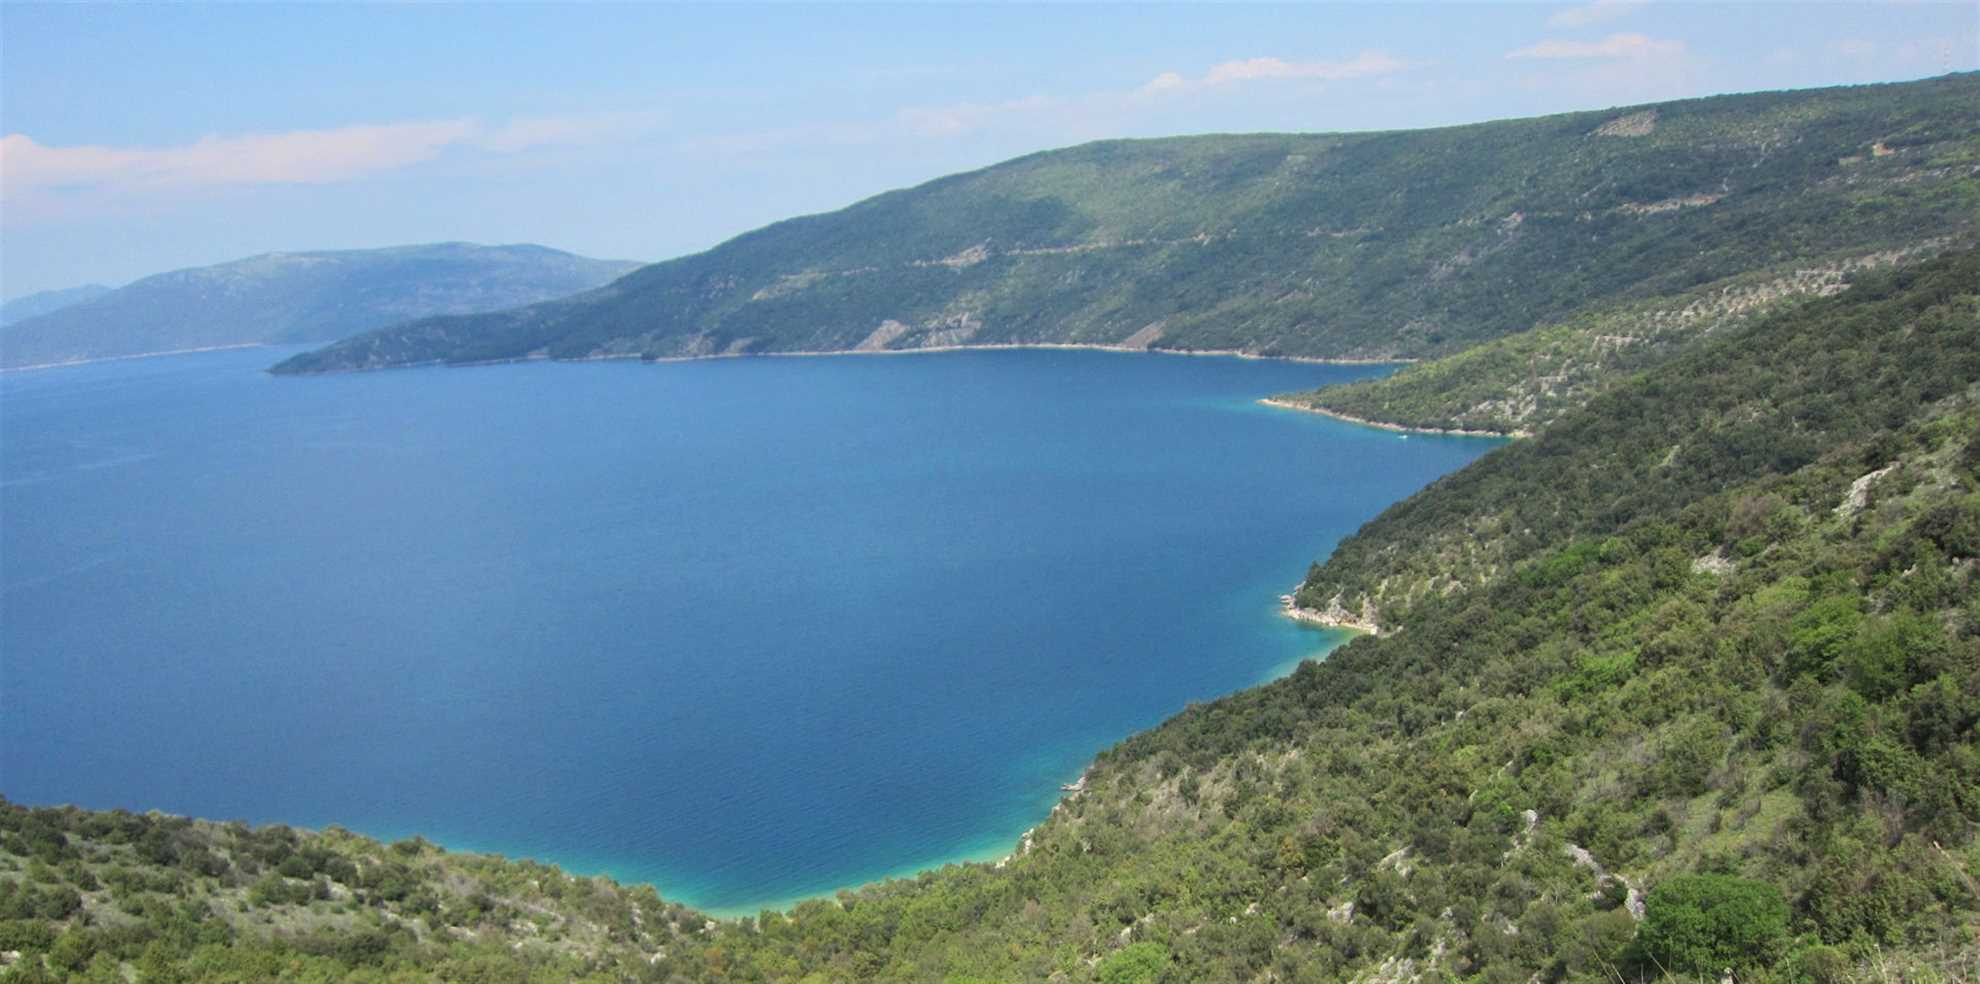 Valun Beach on Cres Island in Croatia